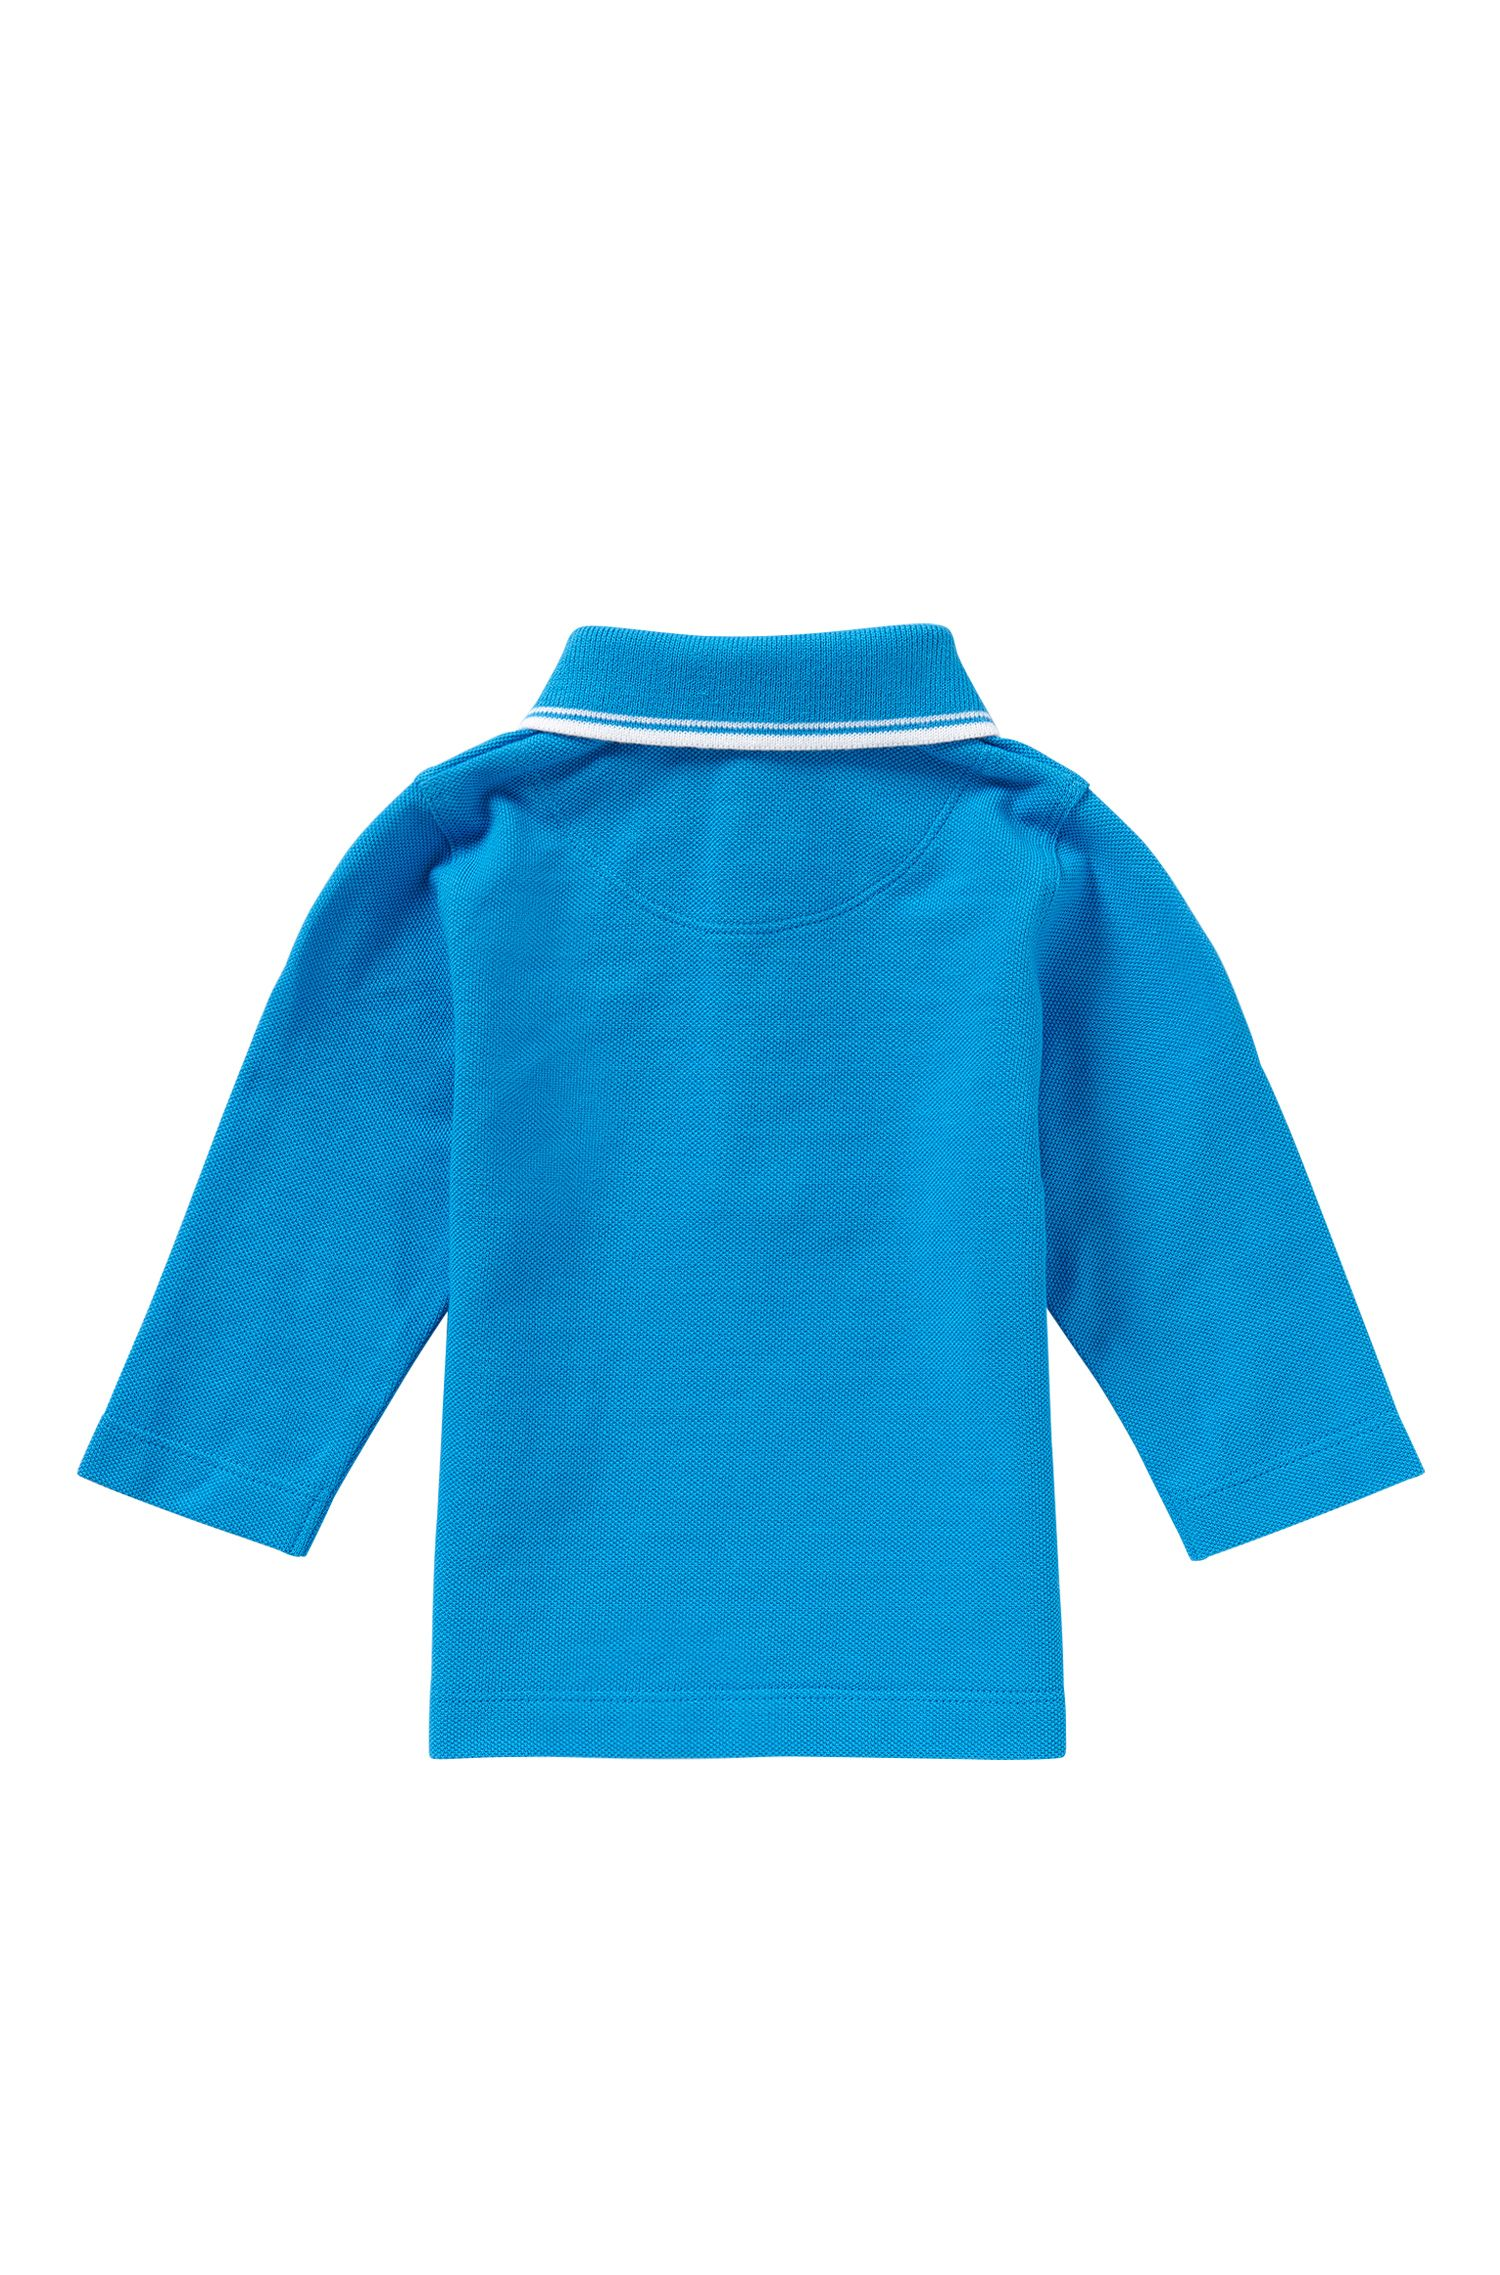 Baby-Longsleeve-Poloshirt aus Baumwolle: 'J05448'